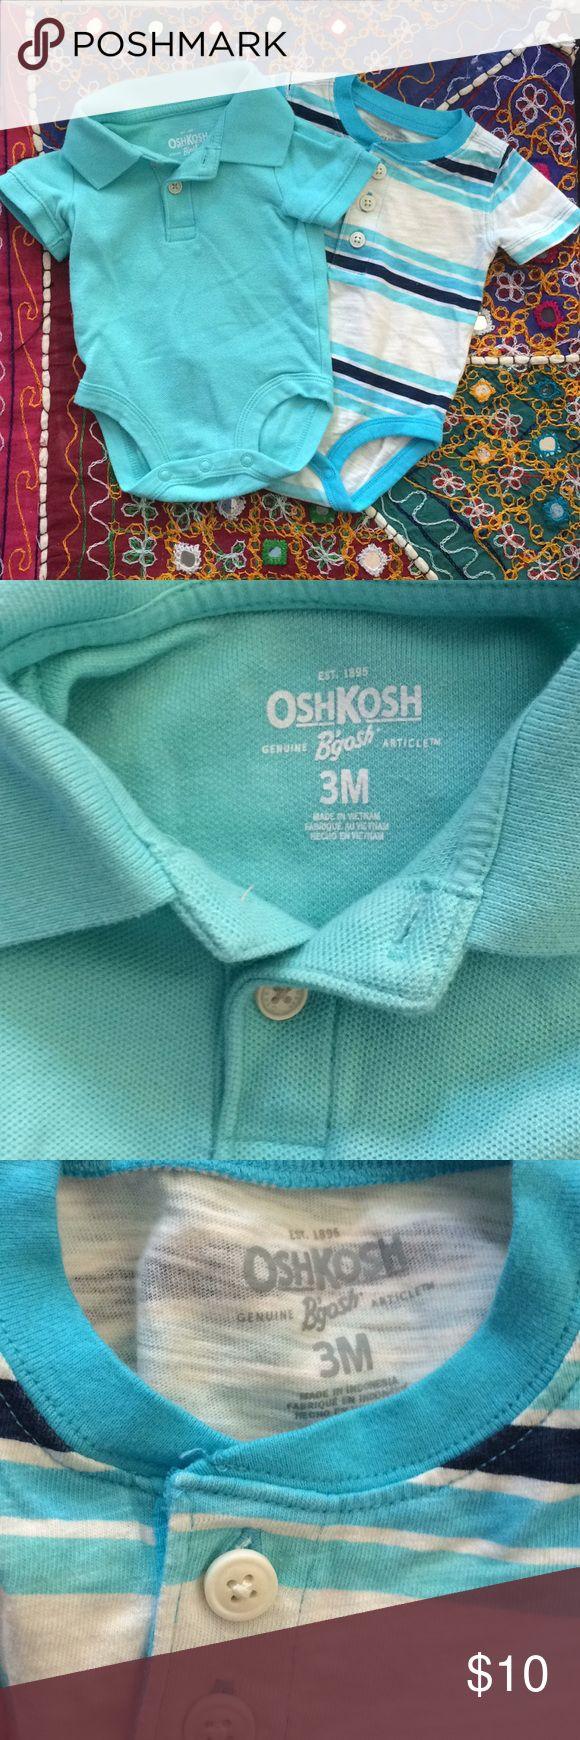 Bundle of 2 Oshkosh B'Gosh onesies 3M blue stripe 2 Oshkosh B'Gosh brand onesies. Short sleeve. One Tiffany blue polo collar shirt with 3 neck bottoms and 3 bottom snaps. Bodysuits One tiffany blue turquoise and navy stripes Henley. Bundle wit other items in my closet to save 20% OshKosh B'gosh Shirts & Tops Polos